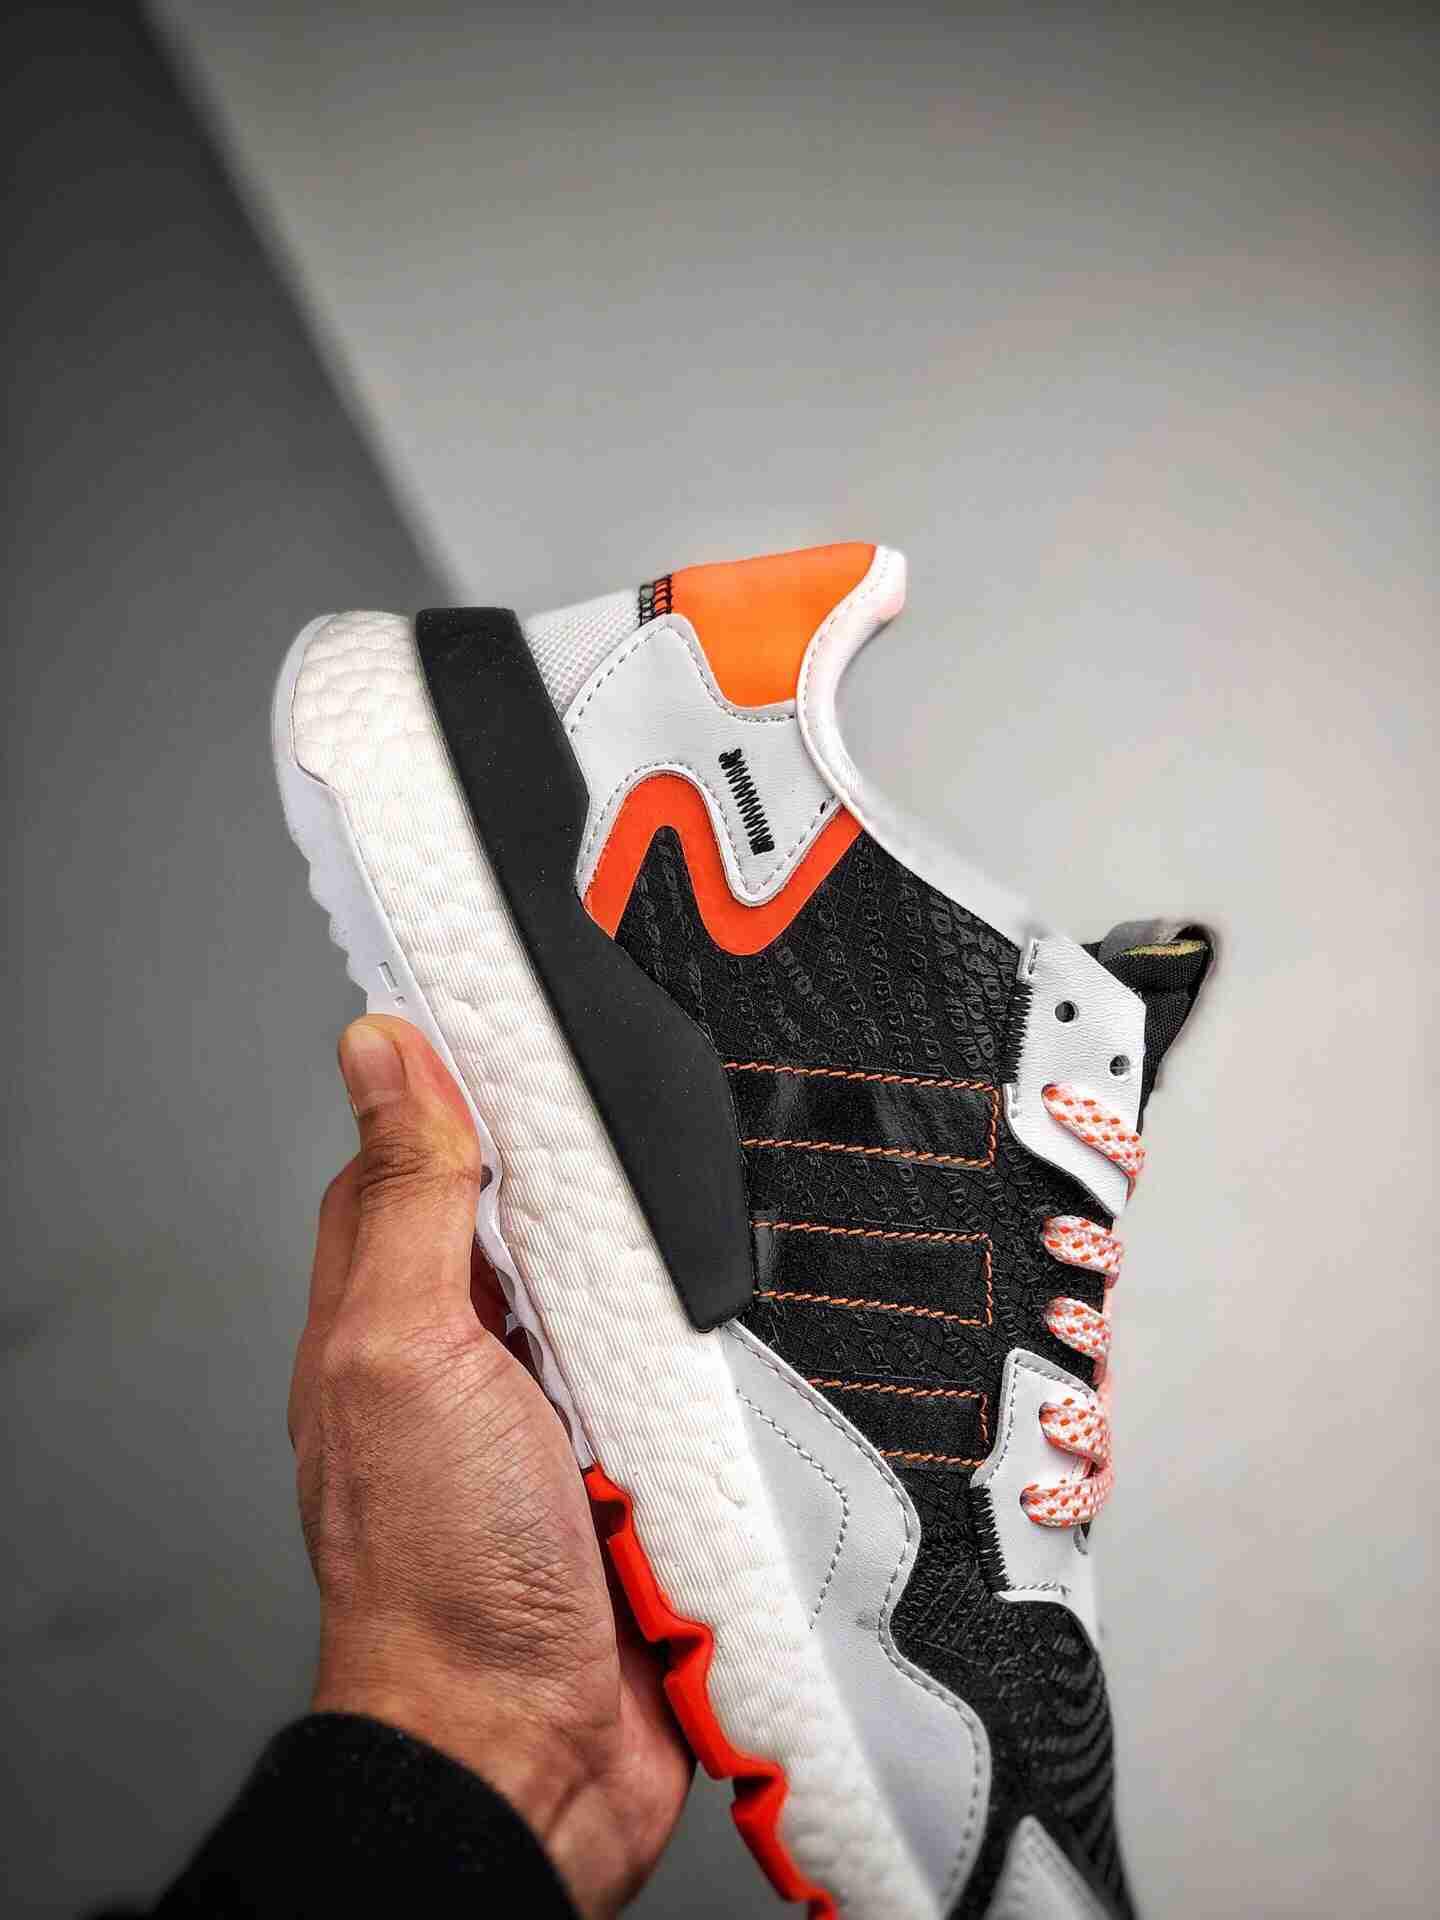 Adidas Nite Jogger 2019 Boost 黑橘3M反光 联名夜行者